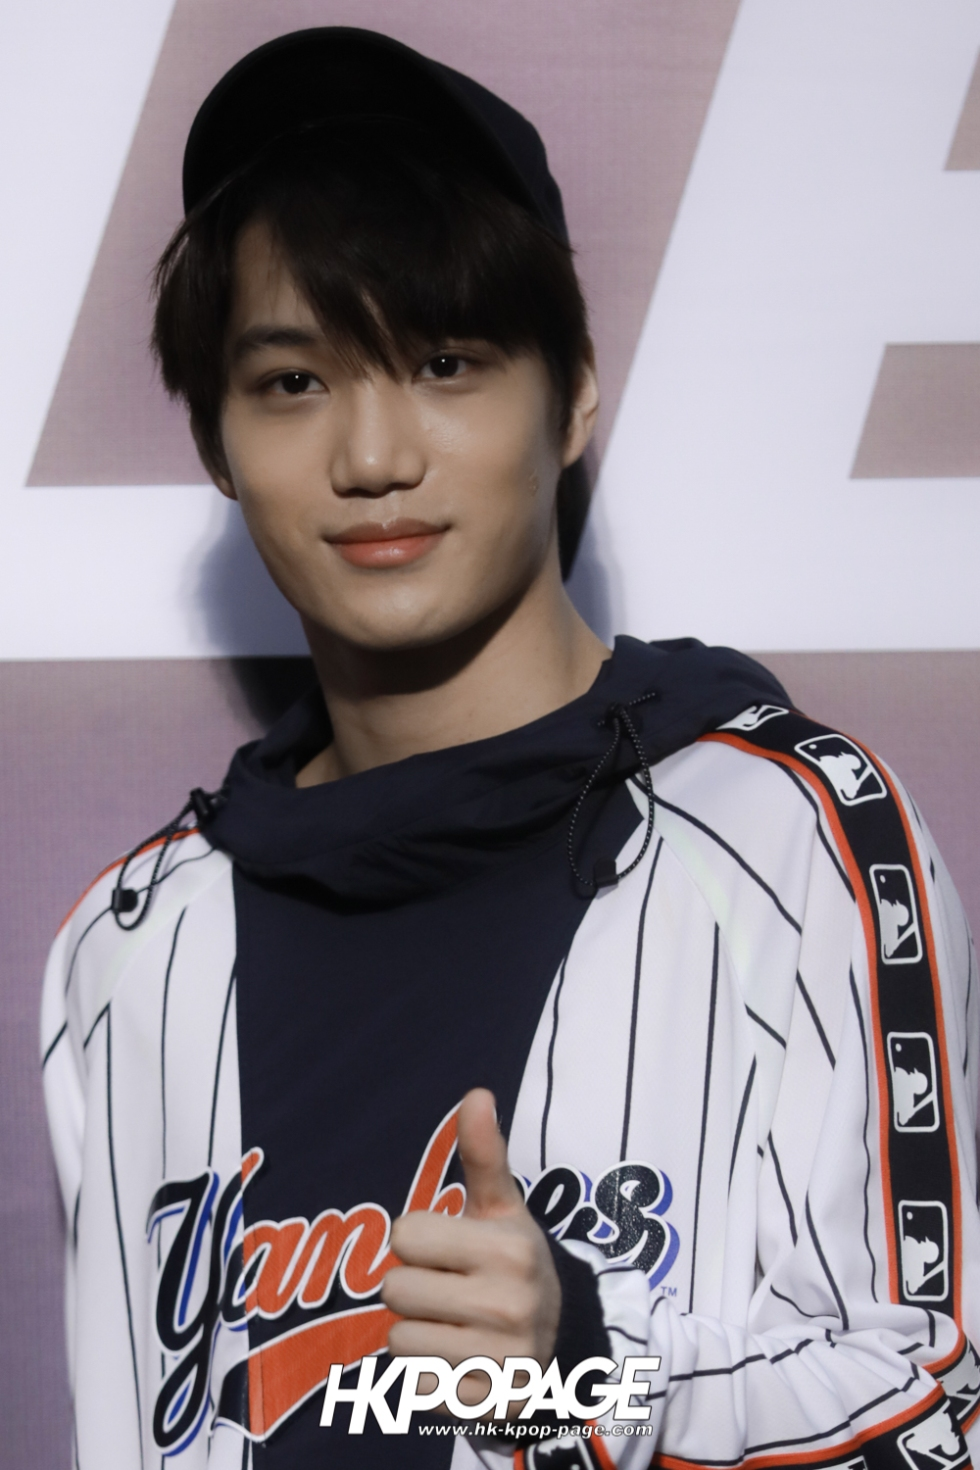 [HK.KPOP.PAGE] 180323_EXO_Chanyeol Kai Sehun_MLB Event_30